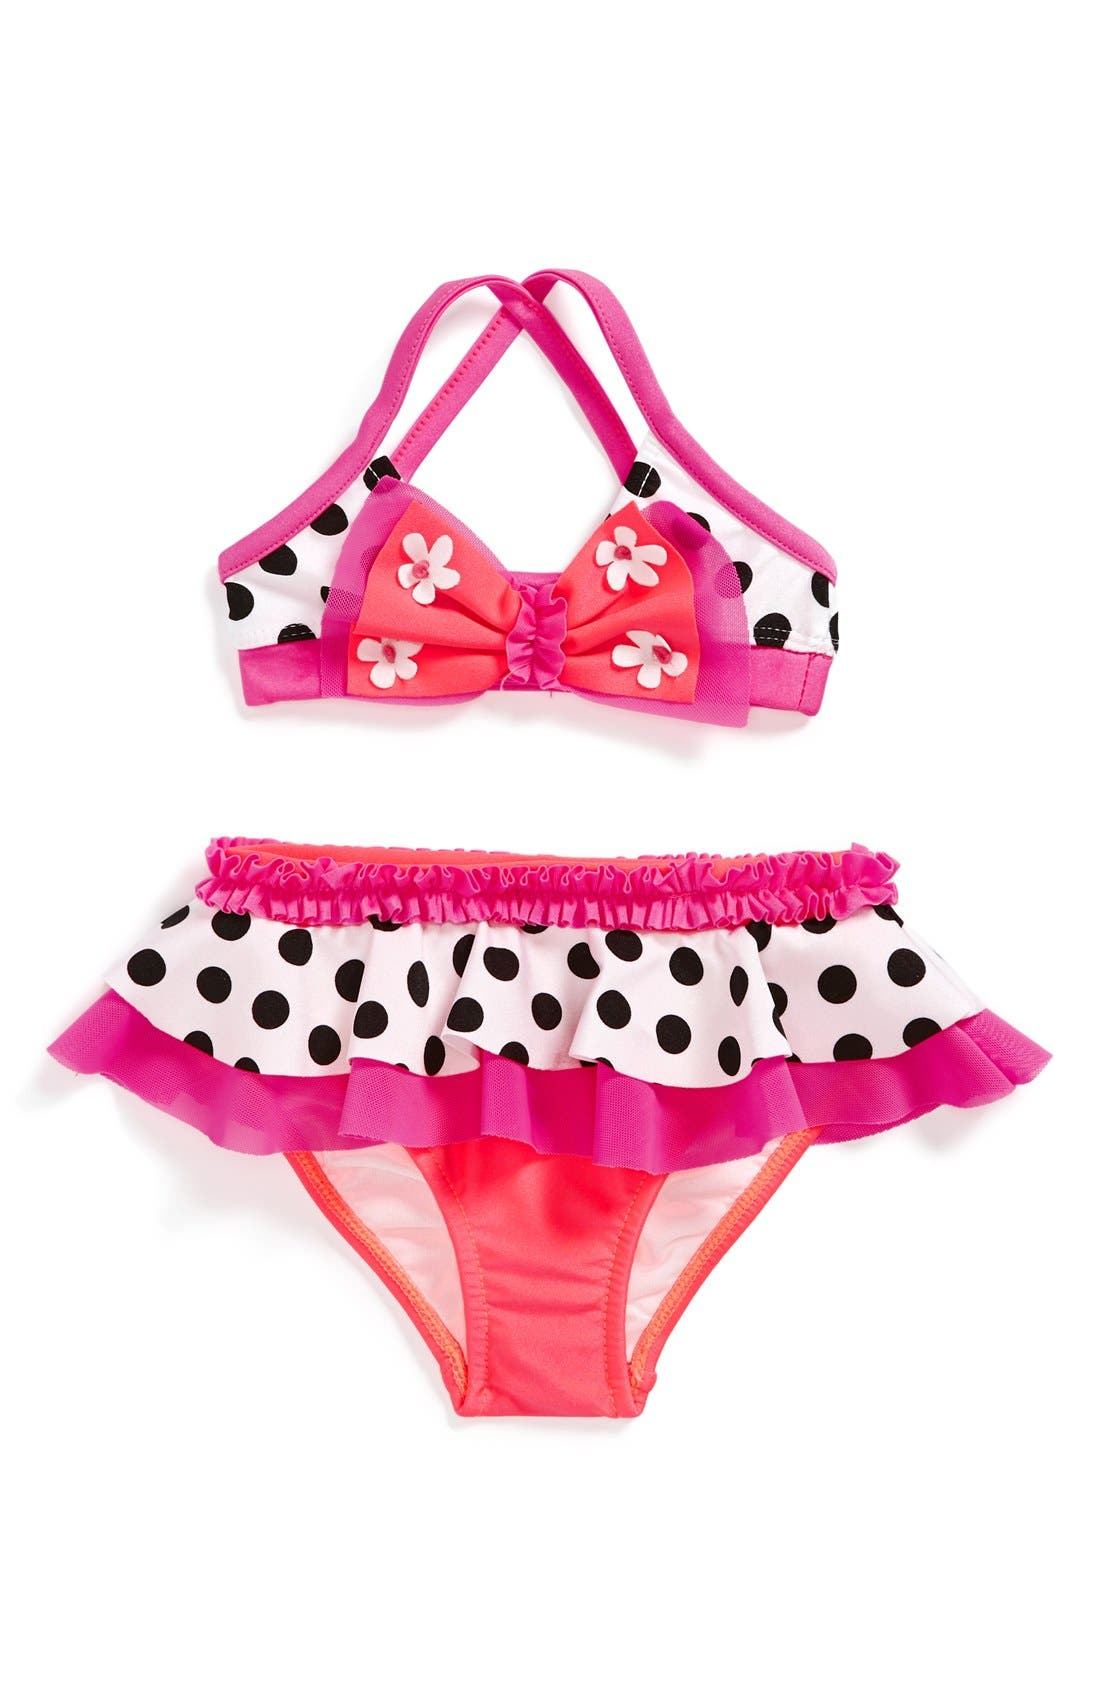 Main Image - Love U Lots 'Butterfly' Two-Piece Swimsuit (Baby Girls)